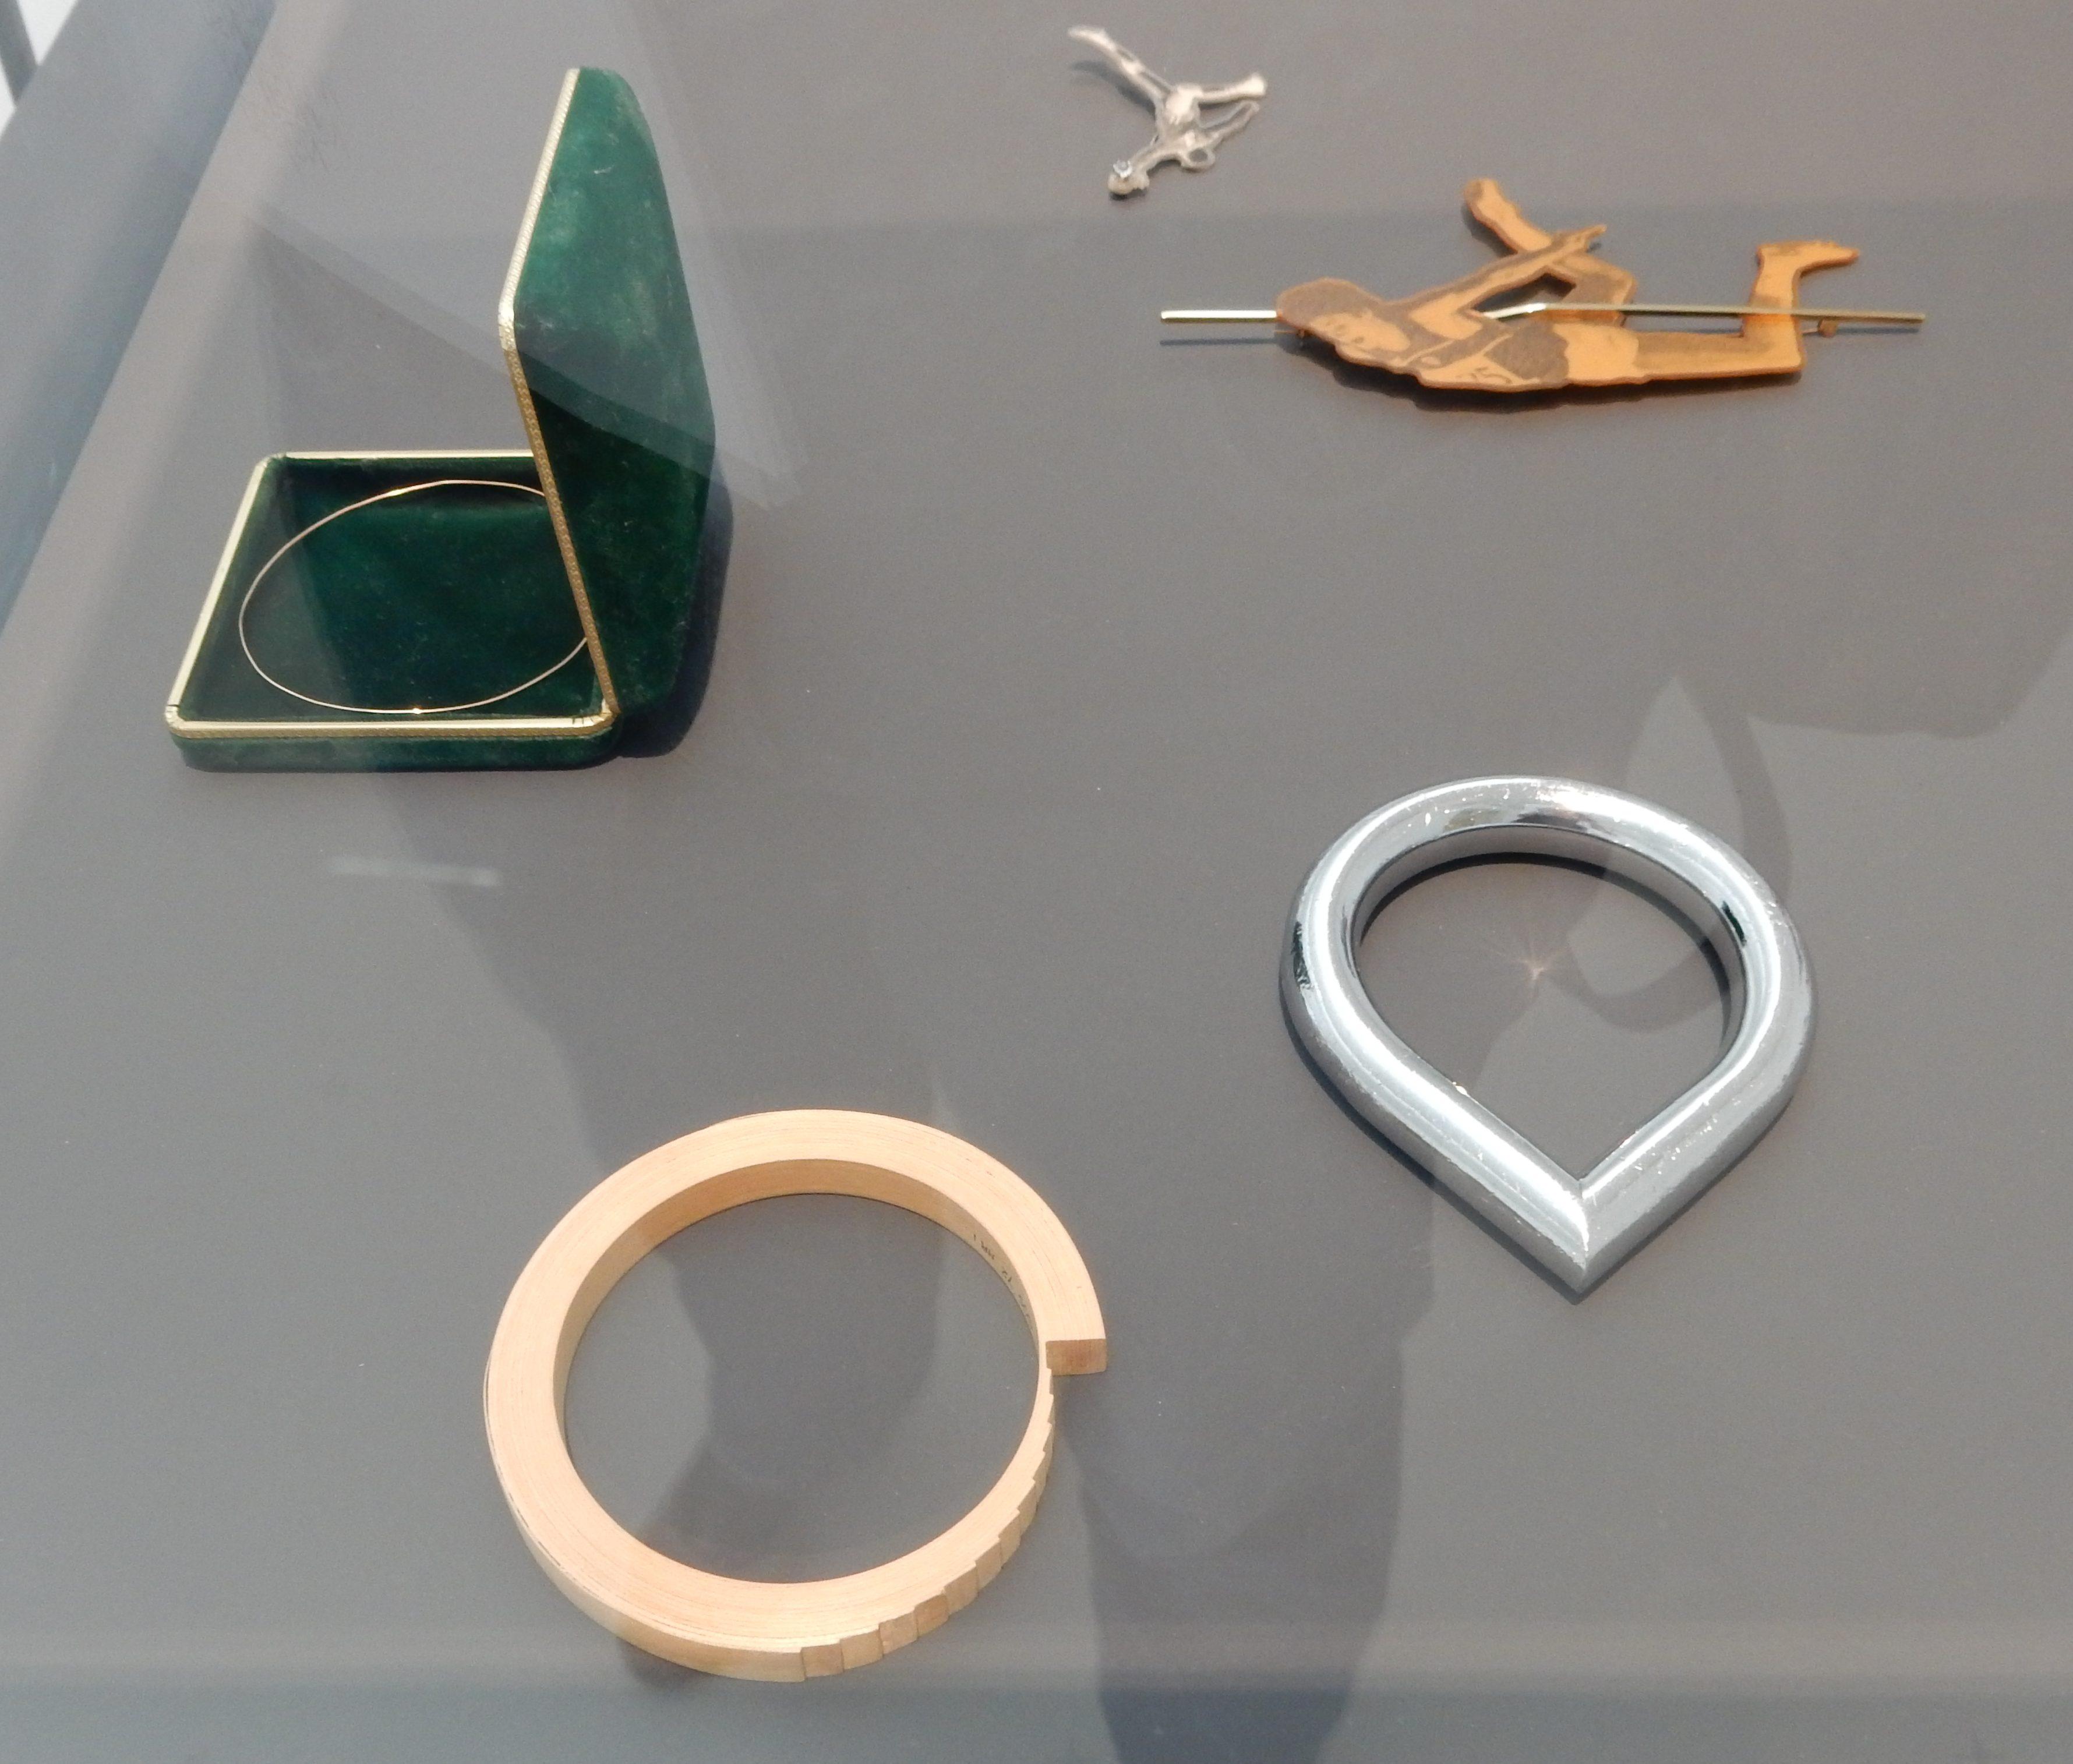 Gijs Bakker. Show Yourself, Design Museum Den Bosch, 2018. Collectie Benno Premsela. Foto Esther Doornbusch, 28 augustus 2018, CC BY 4.0